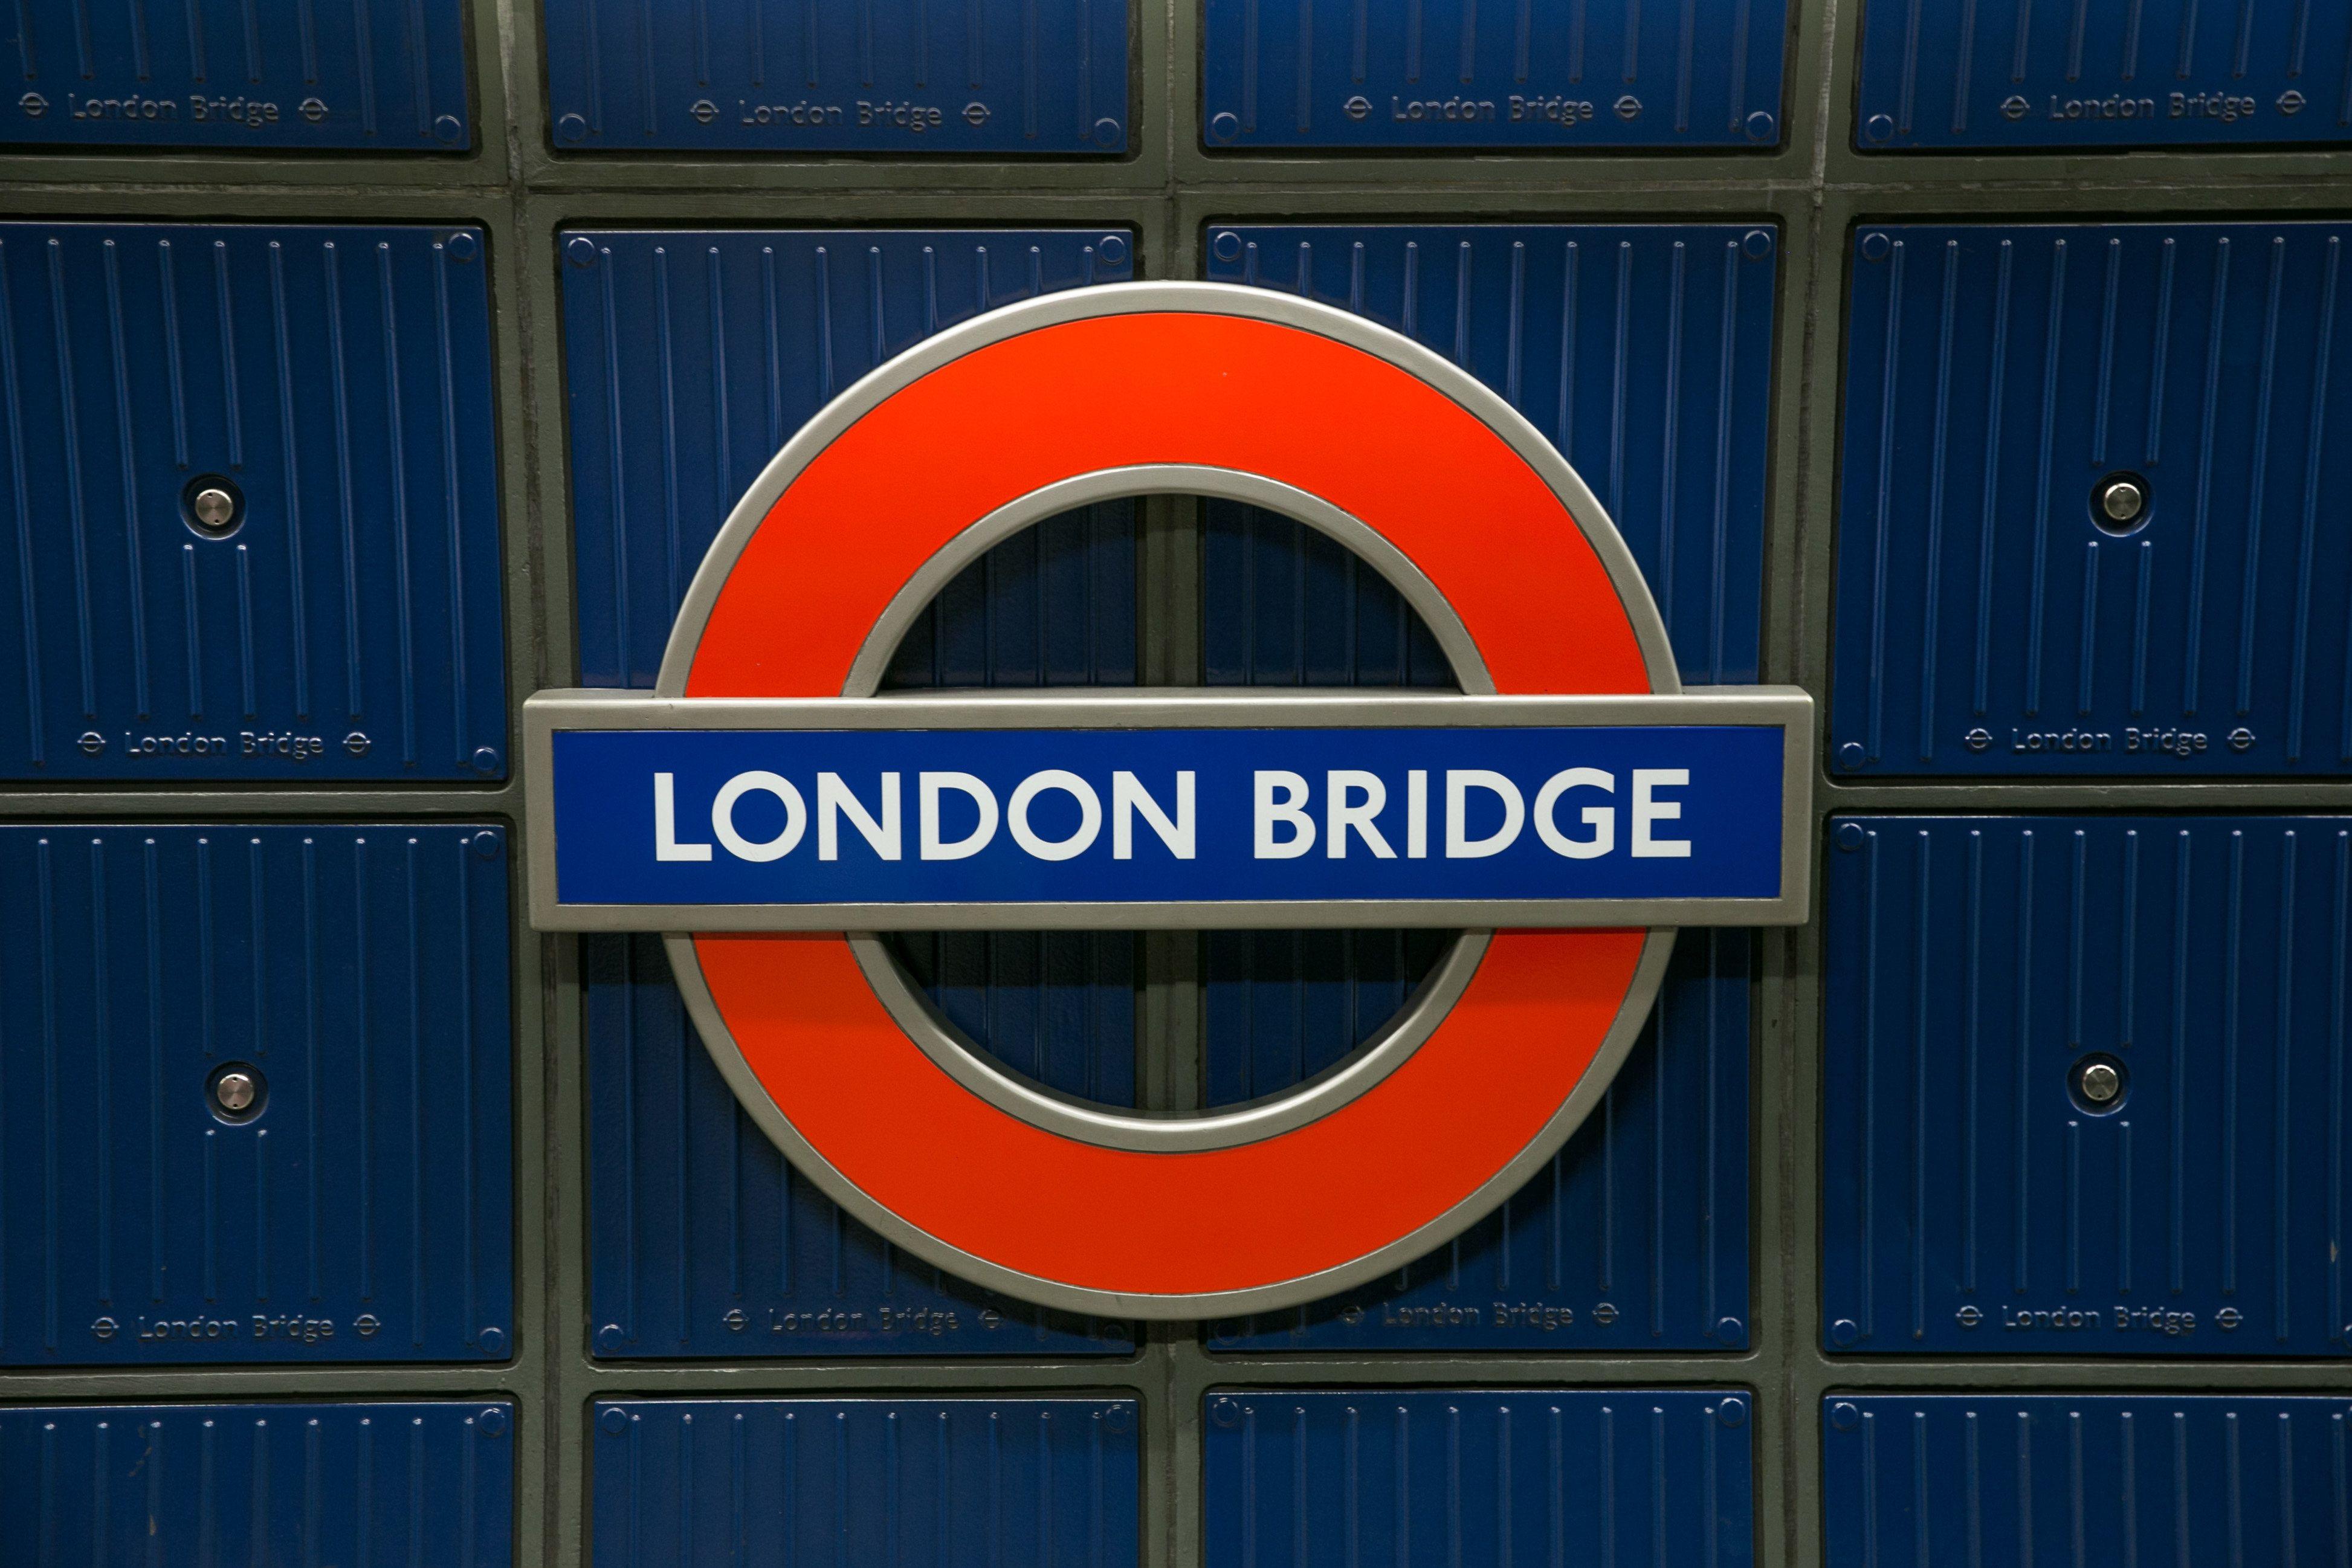 London Bridge Station Stabbing Three Arrests After Platform Fight London Underground Stations London Bridge London Underground Tube